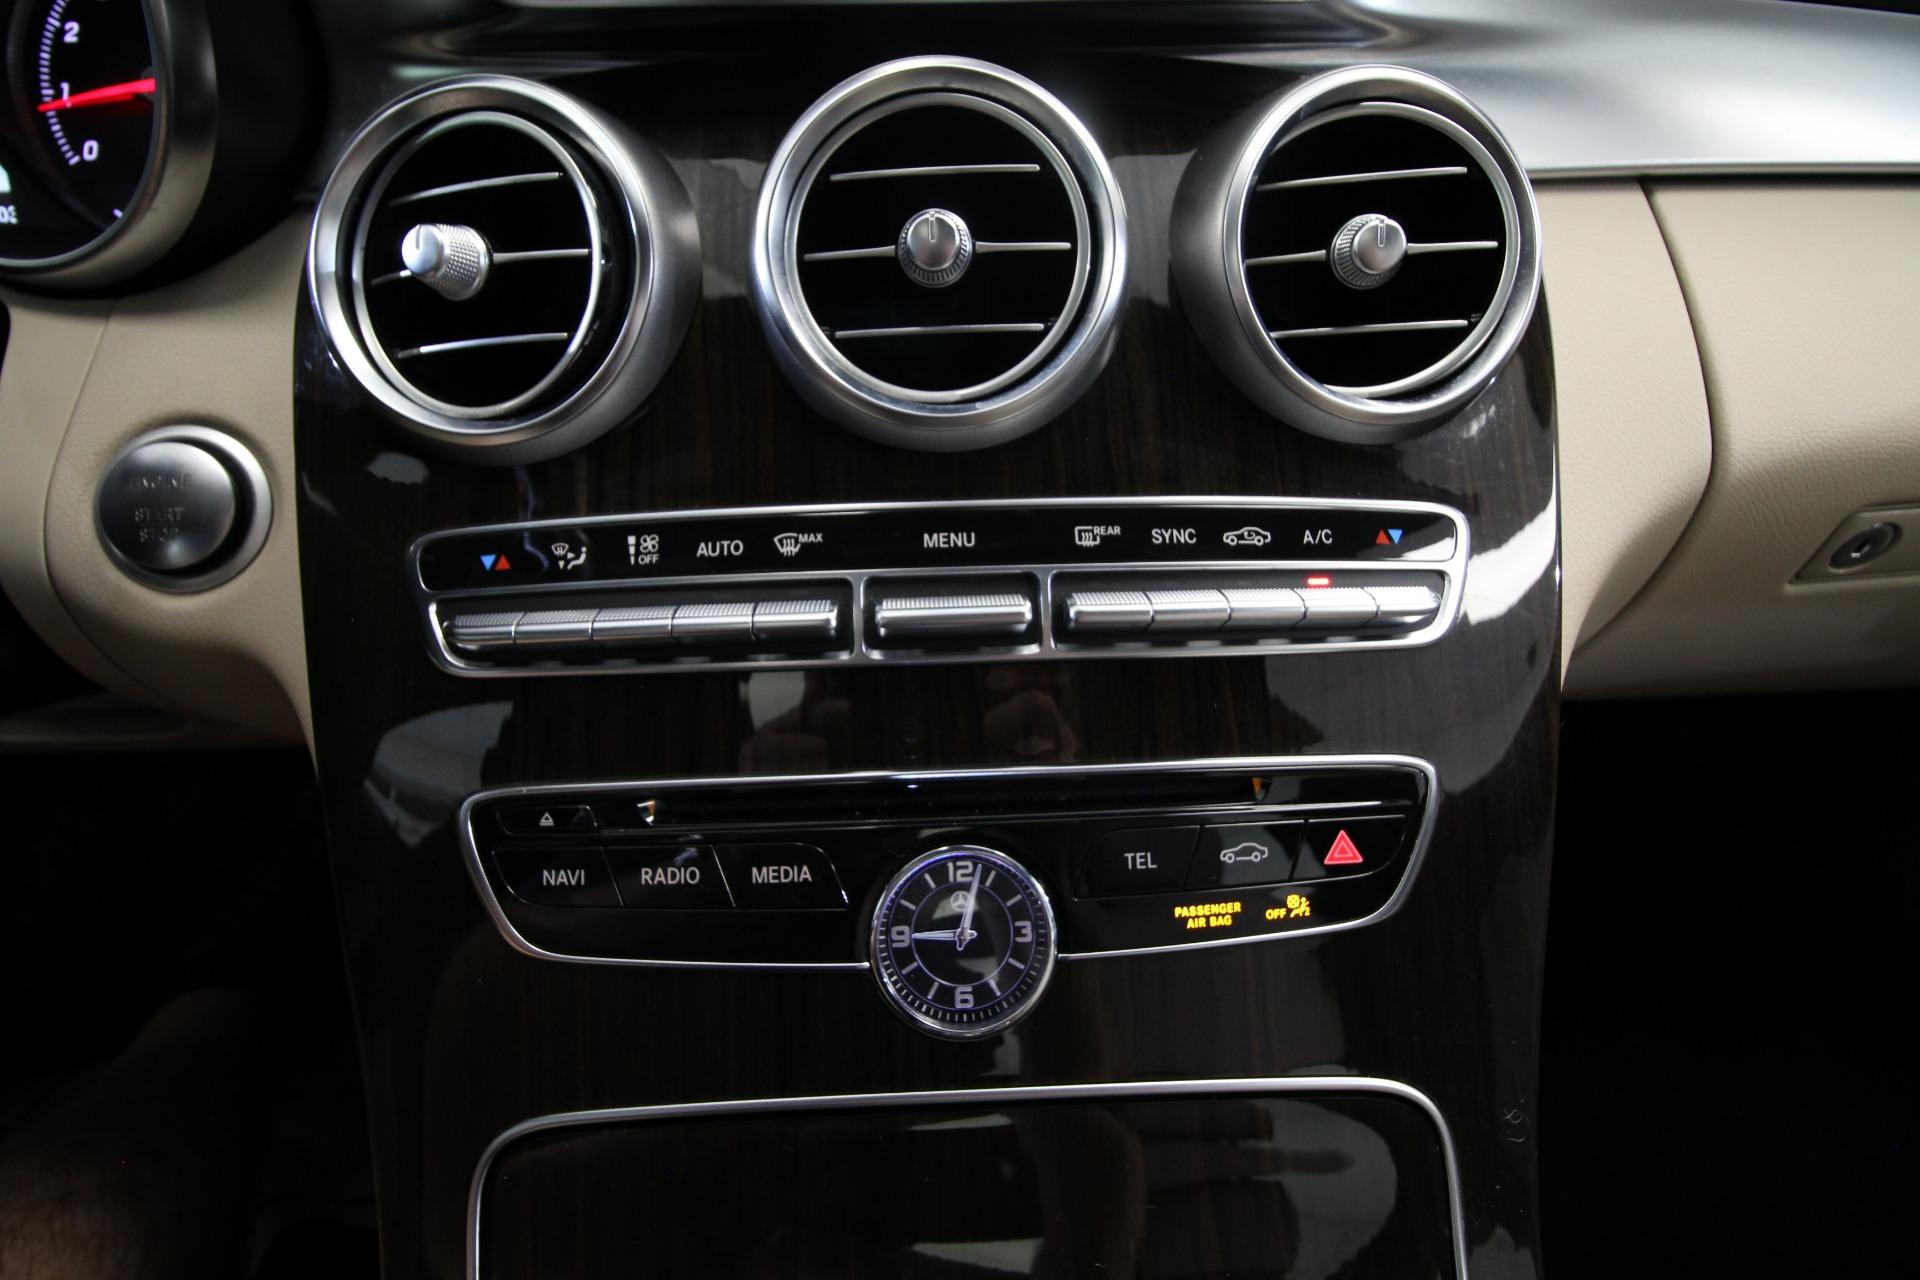 Used 2018 Mercedes-Benz C-Class C300 4MATIC Sedan | Albany, NY